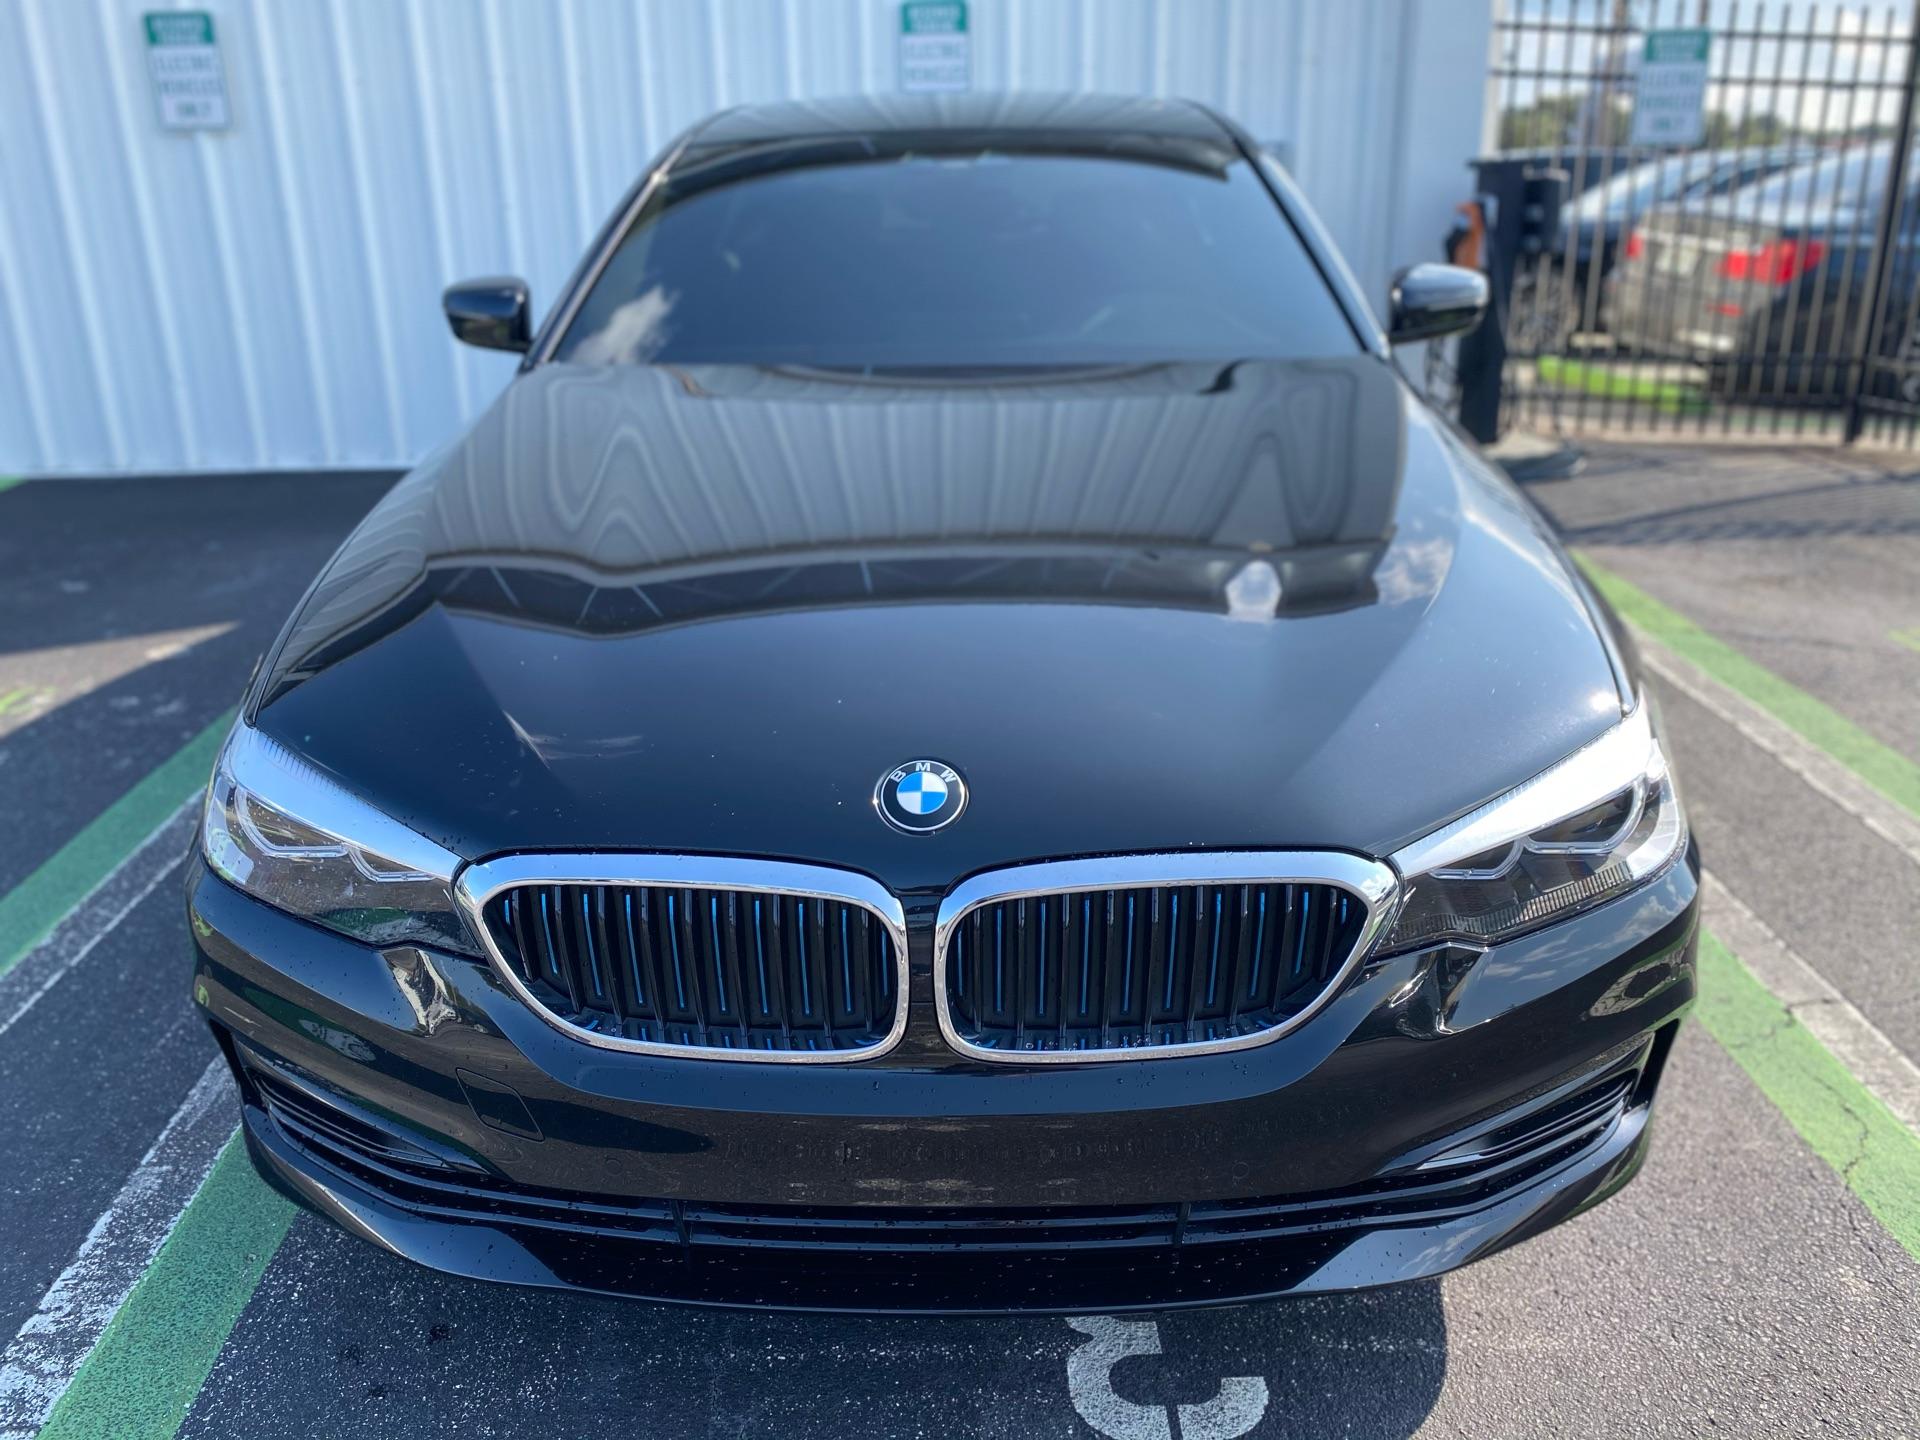 2019 BMW 5 Series - photo 2